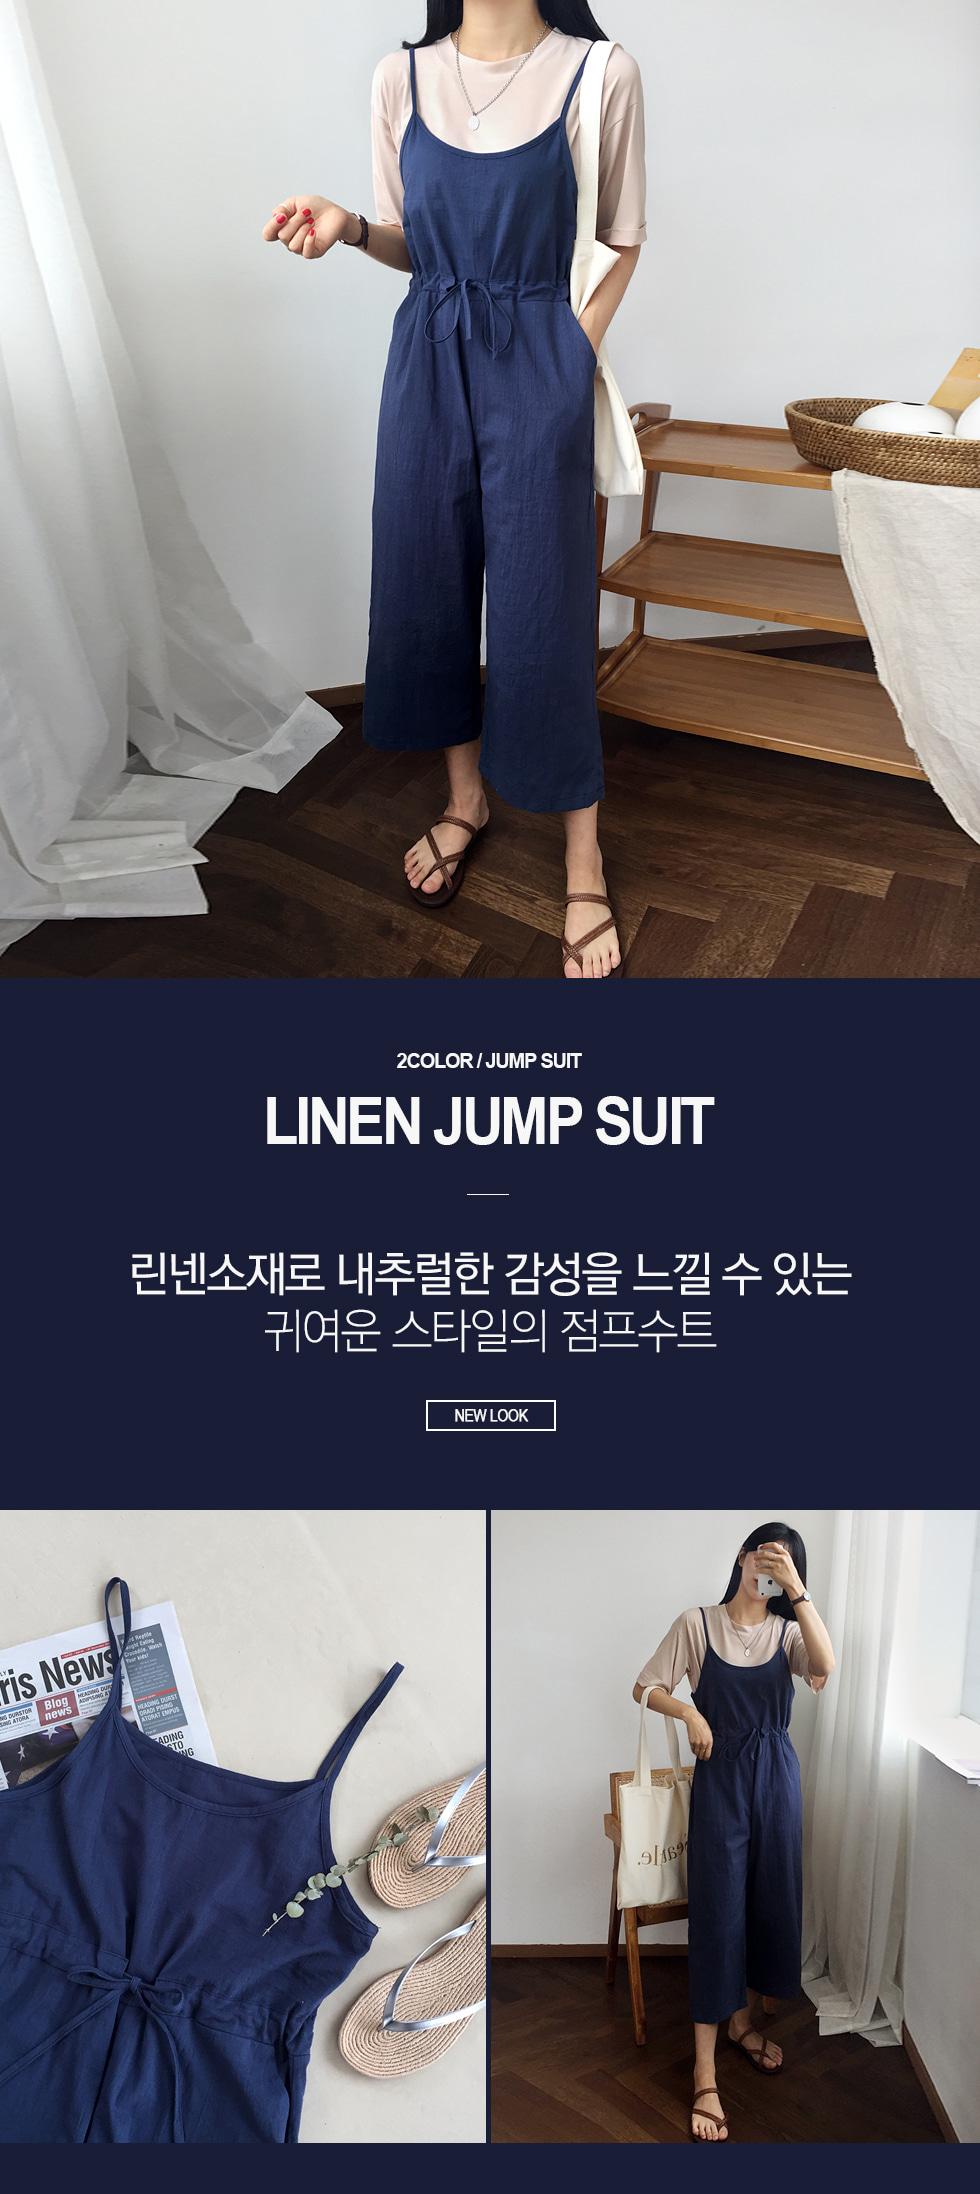 Linen Oyster Jump Suit